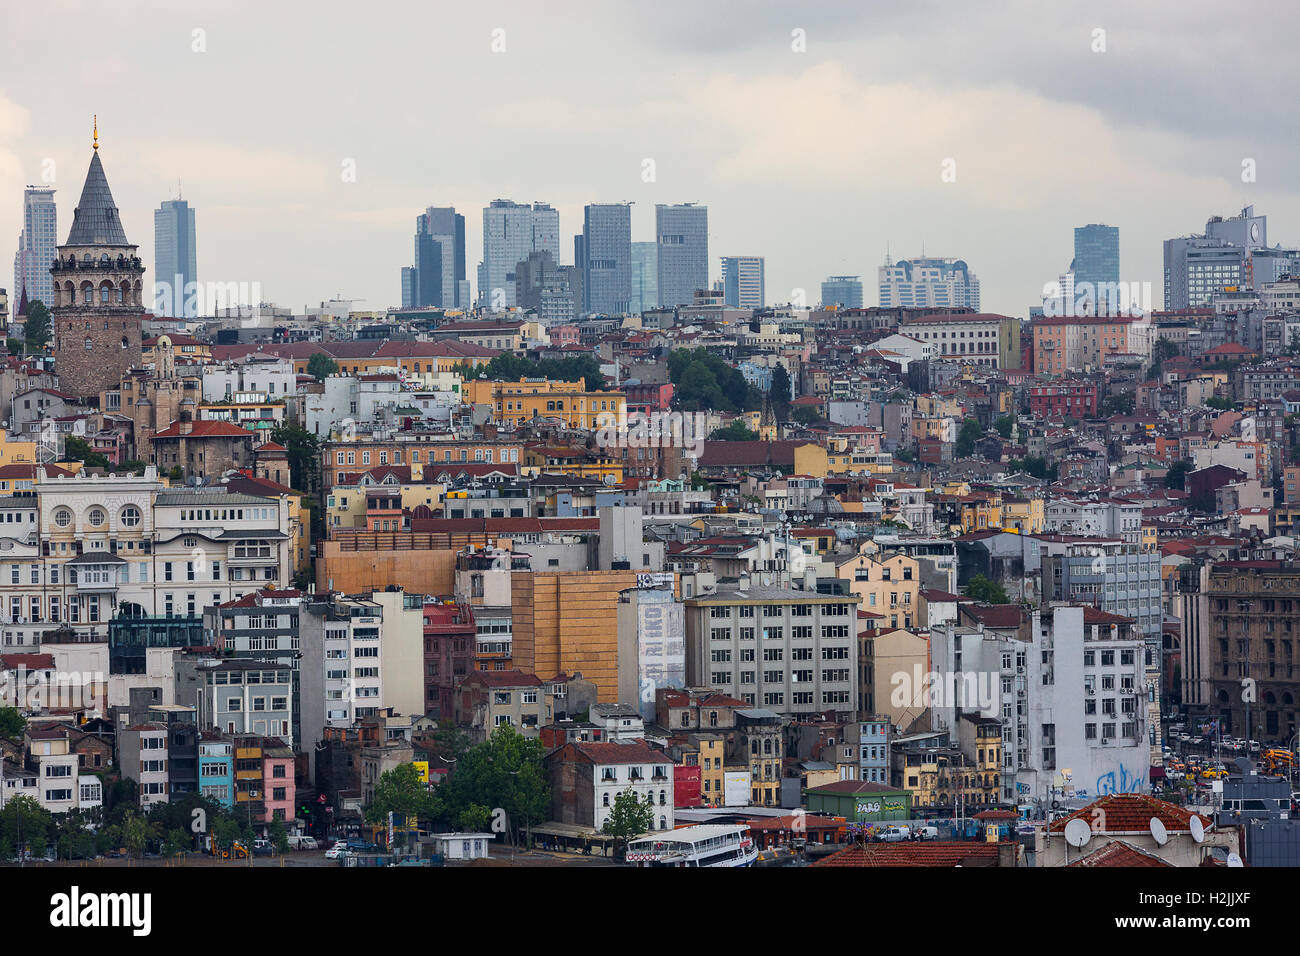 Skyline of Istanbul, Turkey - Stock Image